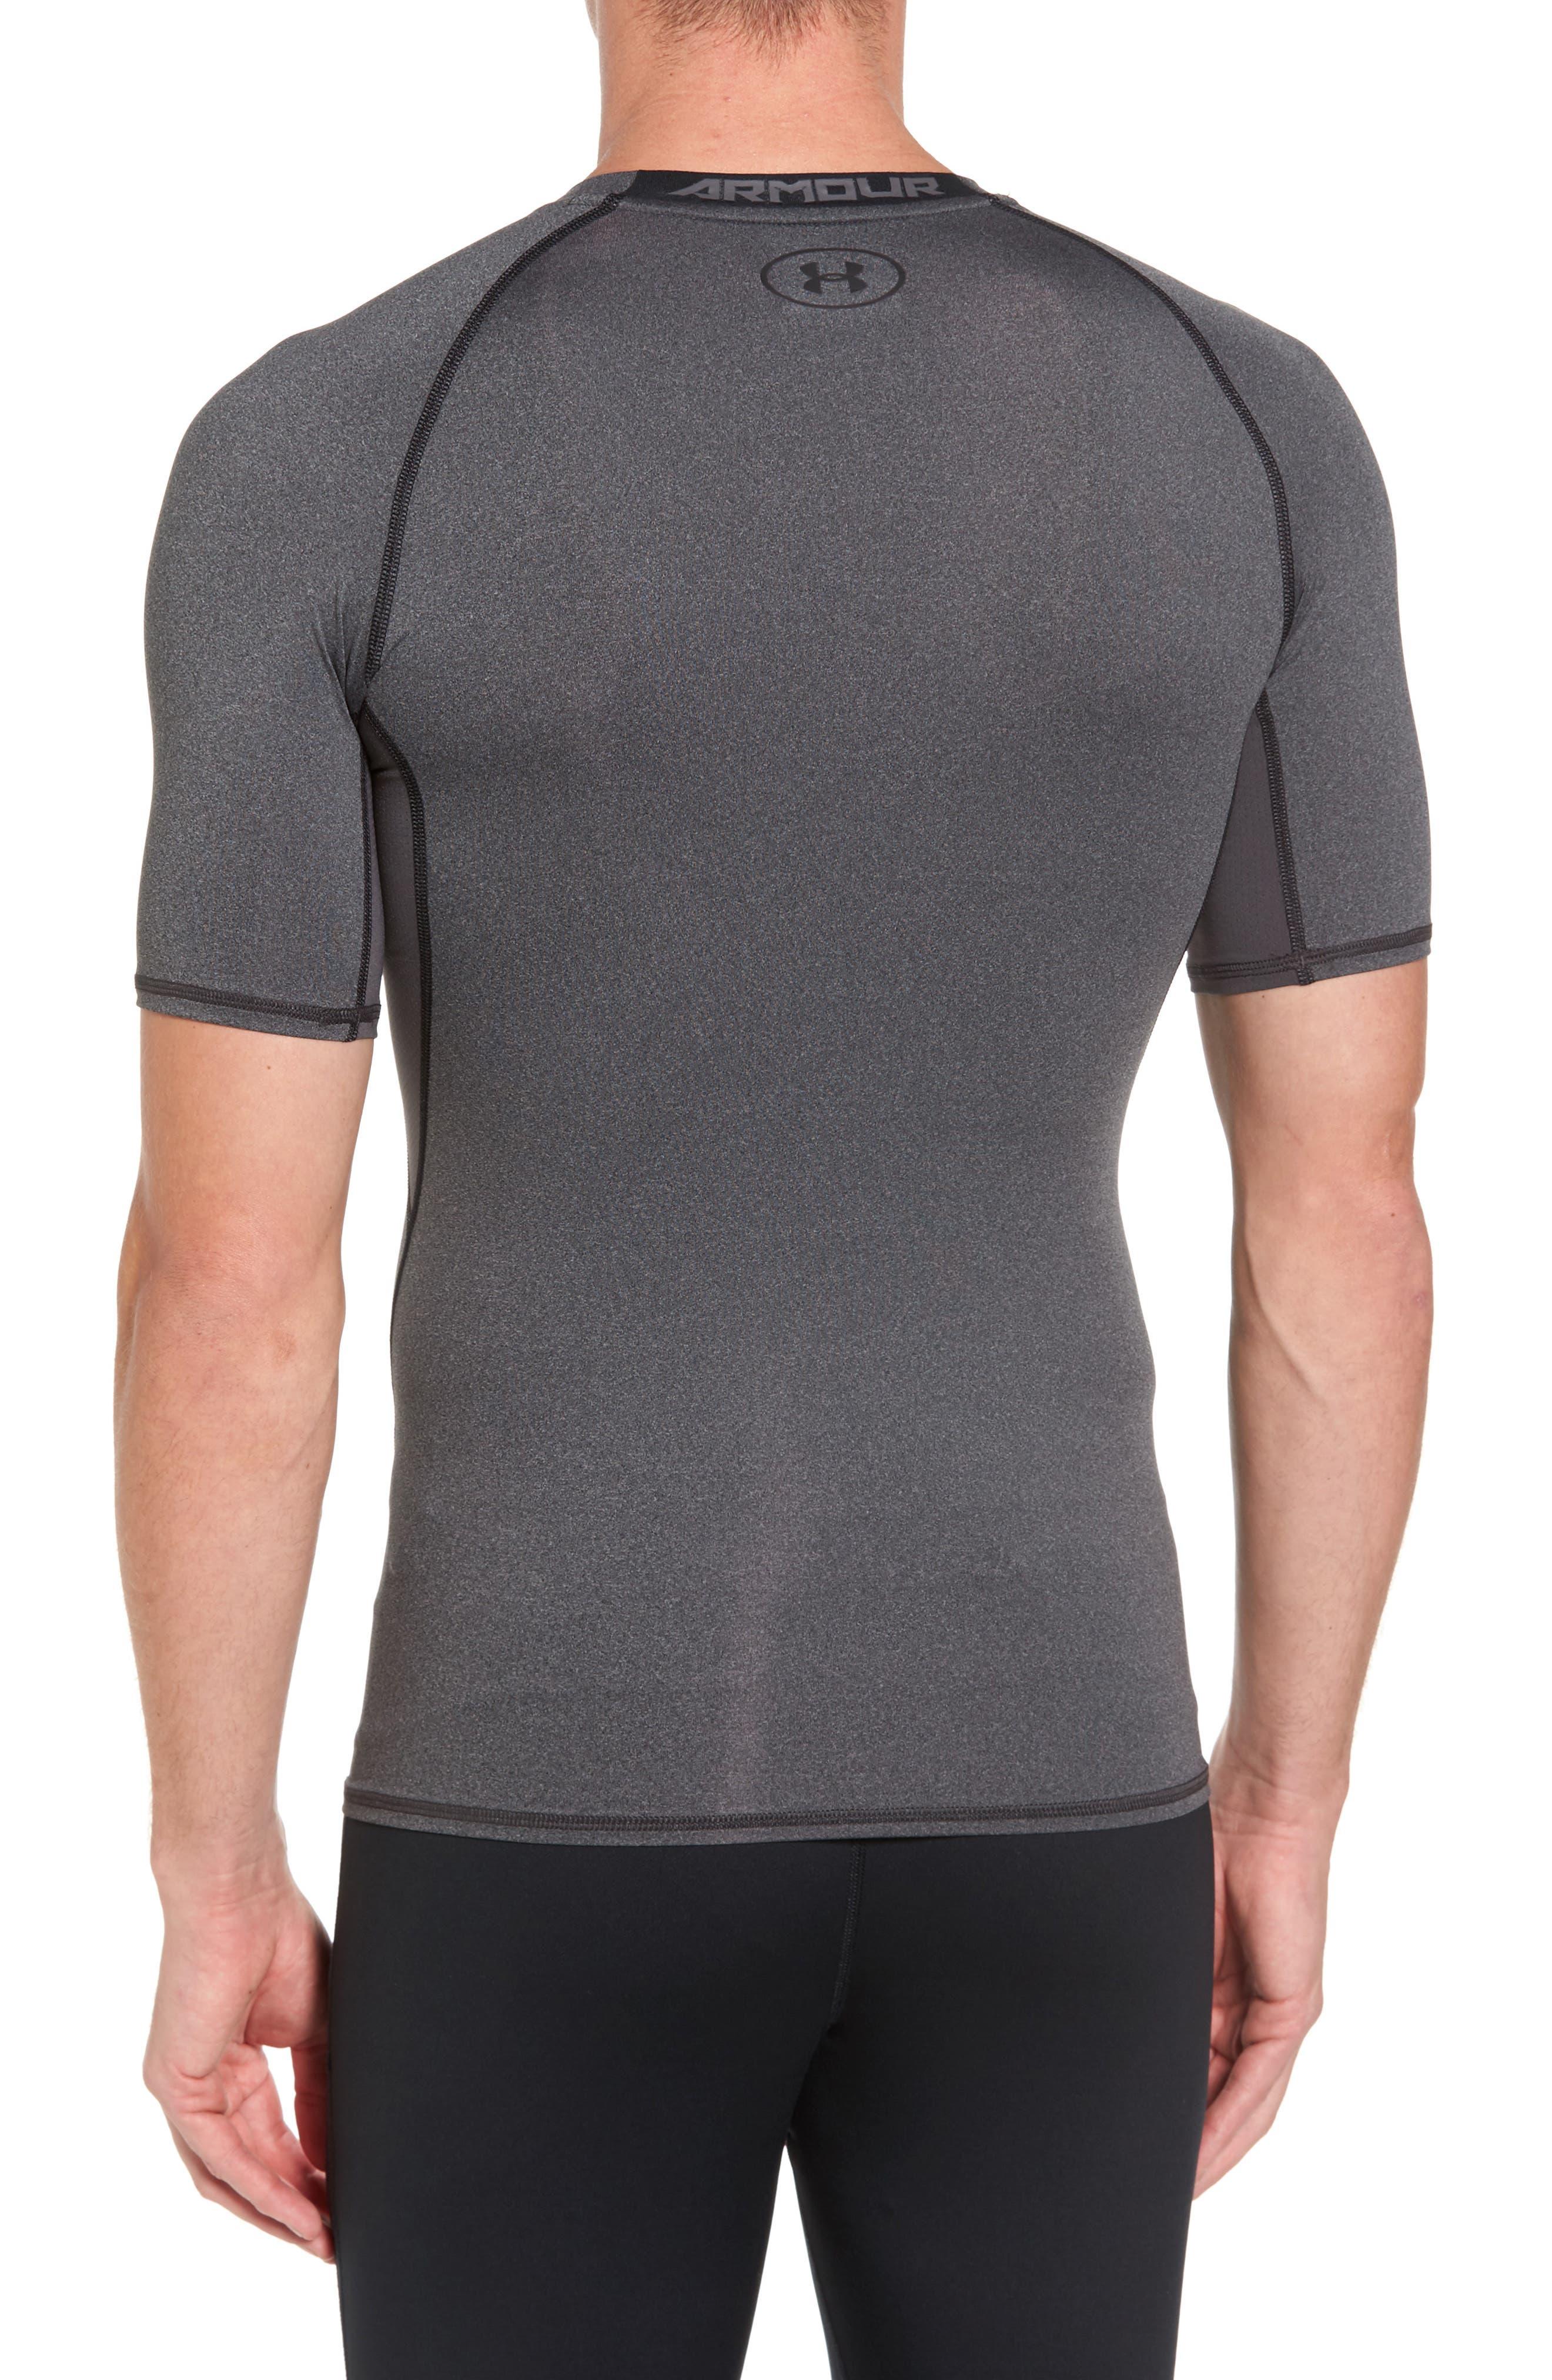 HeatGear<sup>®</sup> Compression Fit T-Shirt,                             Alternate thumbnail 3, color,                             CARBON HEATHER/ BLACK